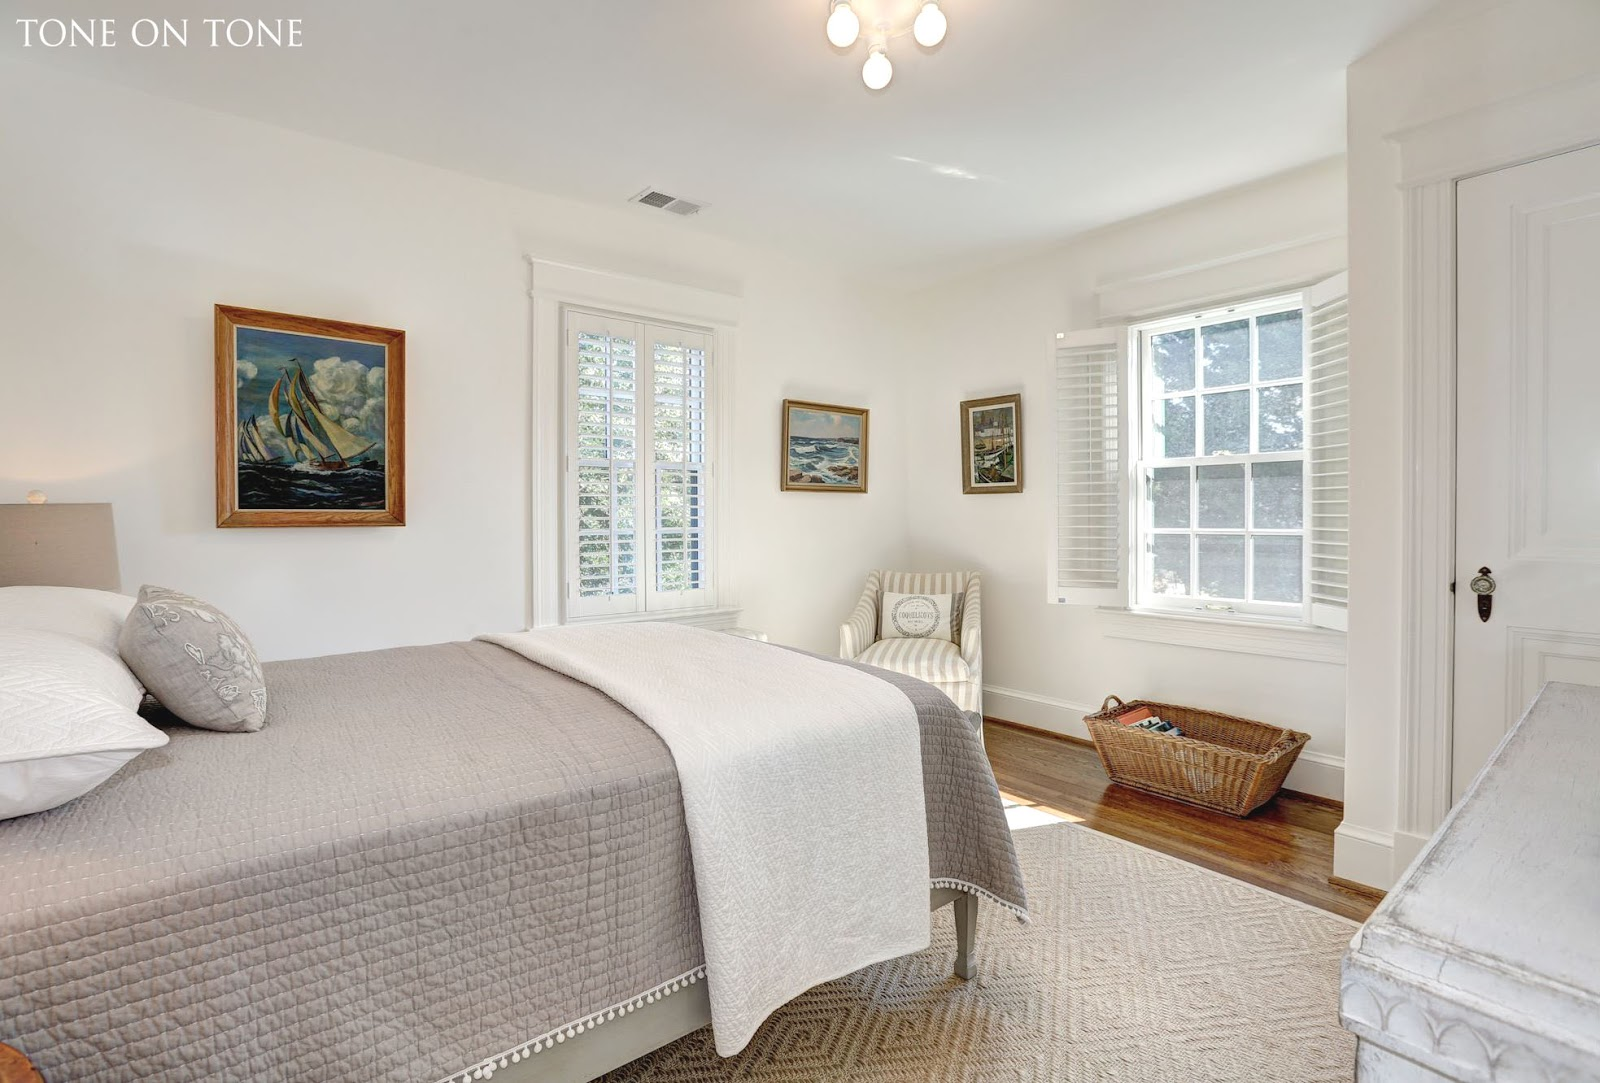 Plantation Style Bedroom Furniture Tone On Tone Our Tudor Home